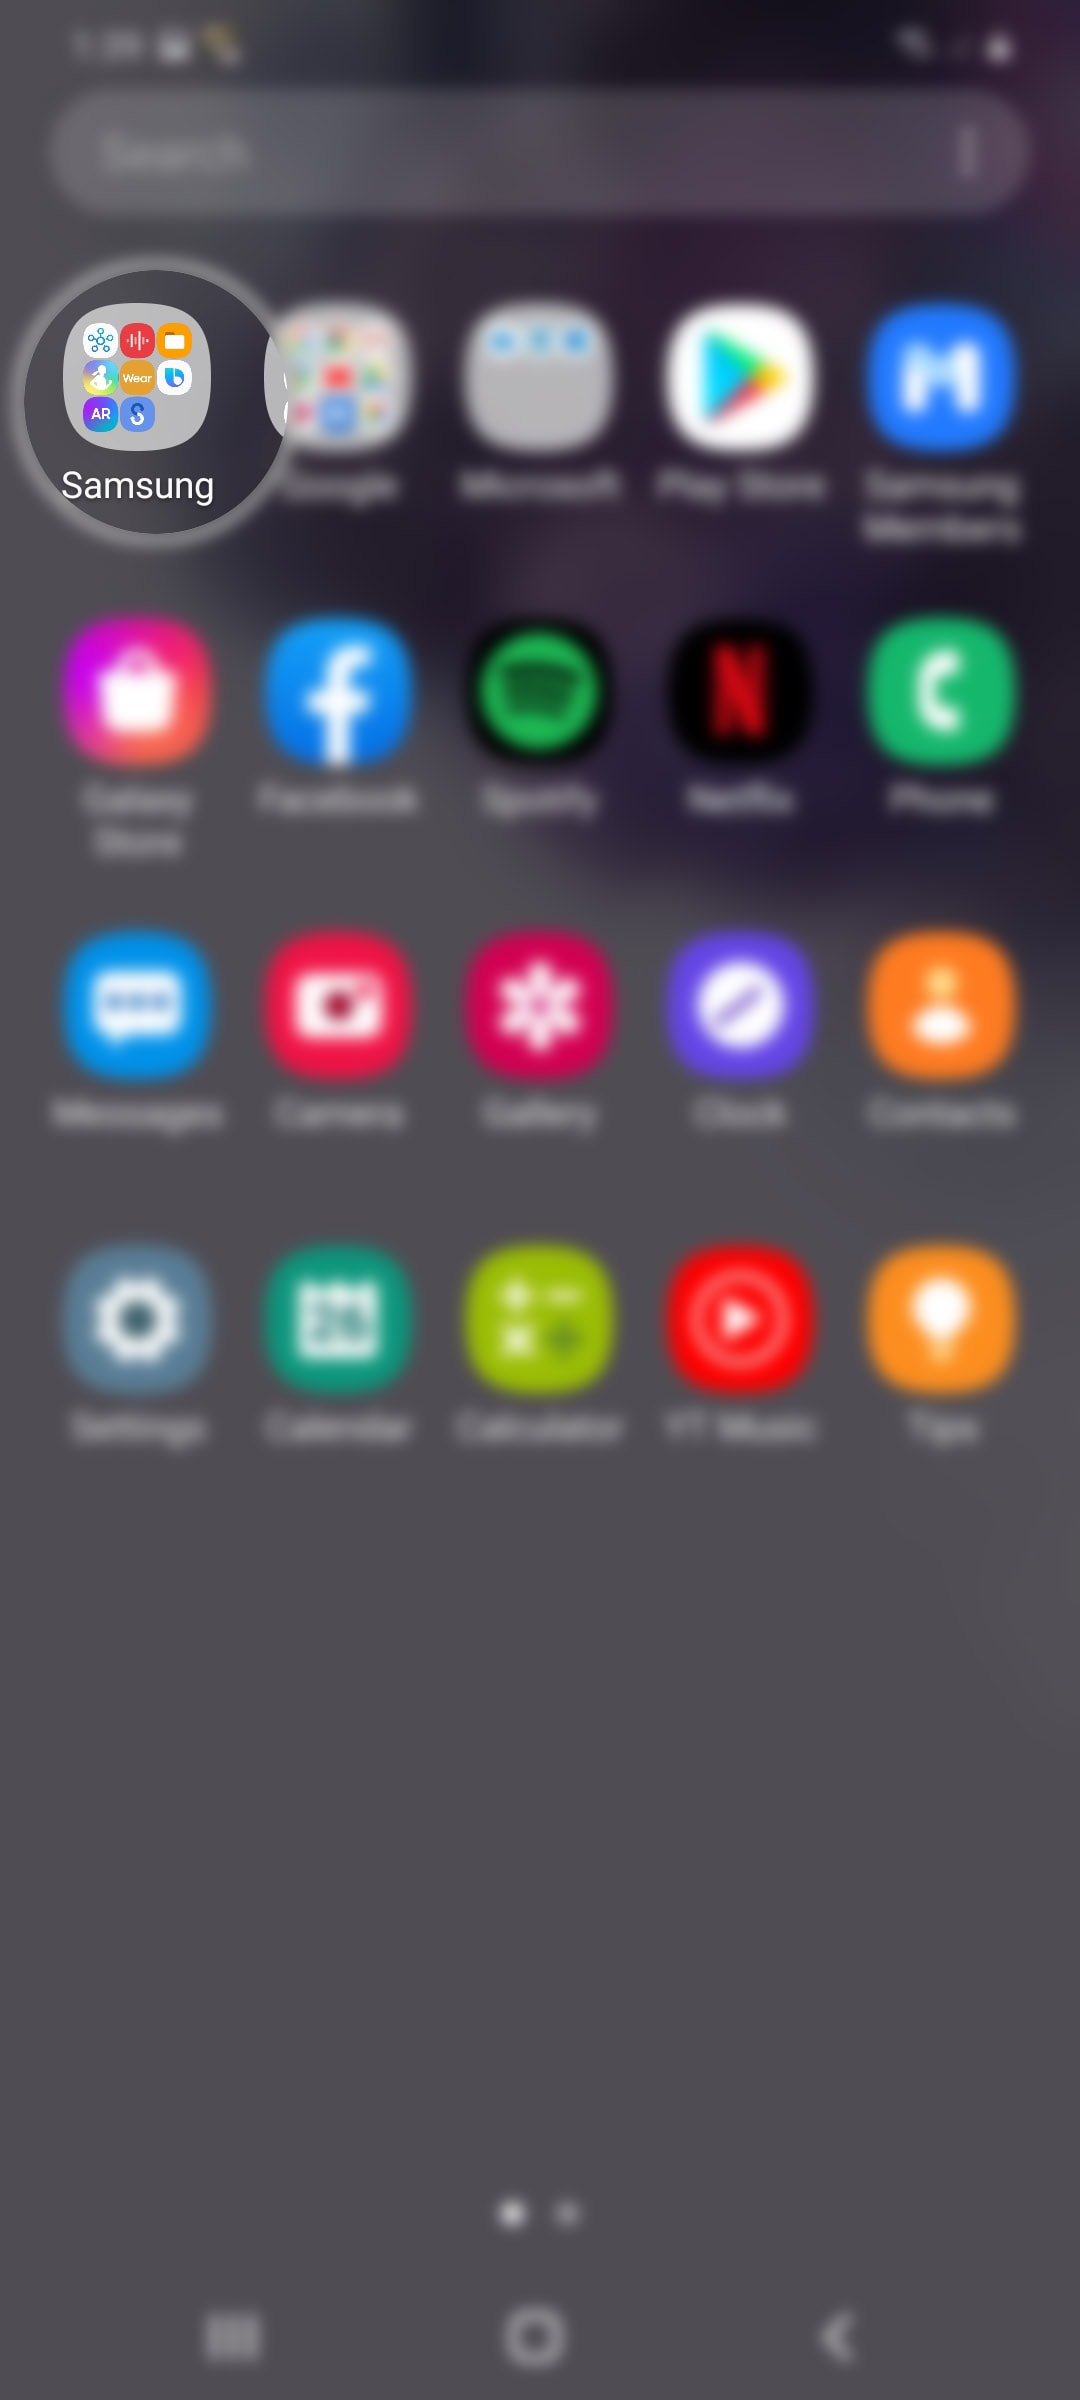 set up samsung health profile galaxy s20 - open samsung app